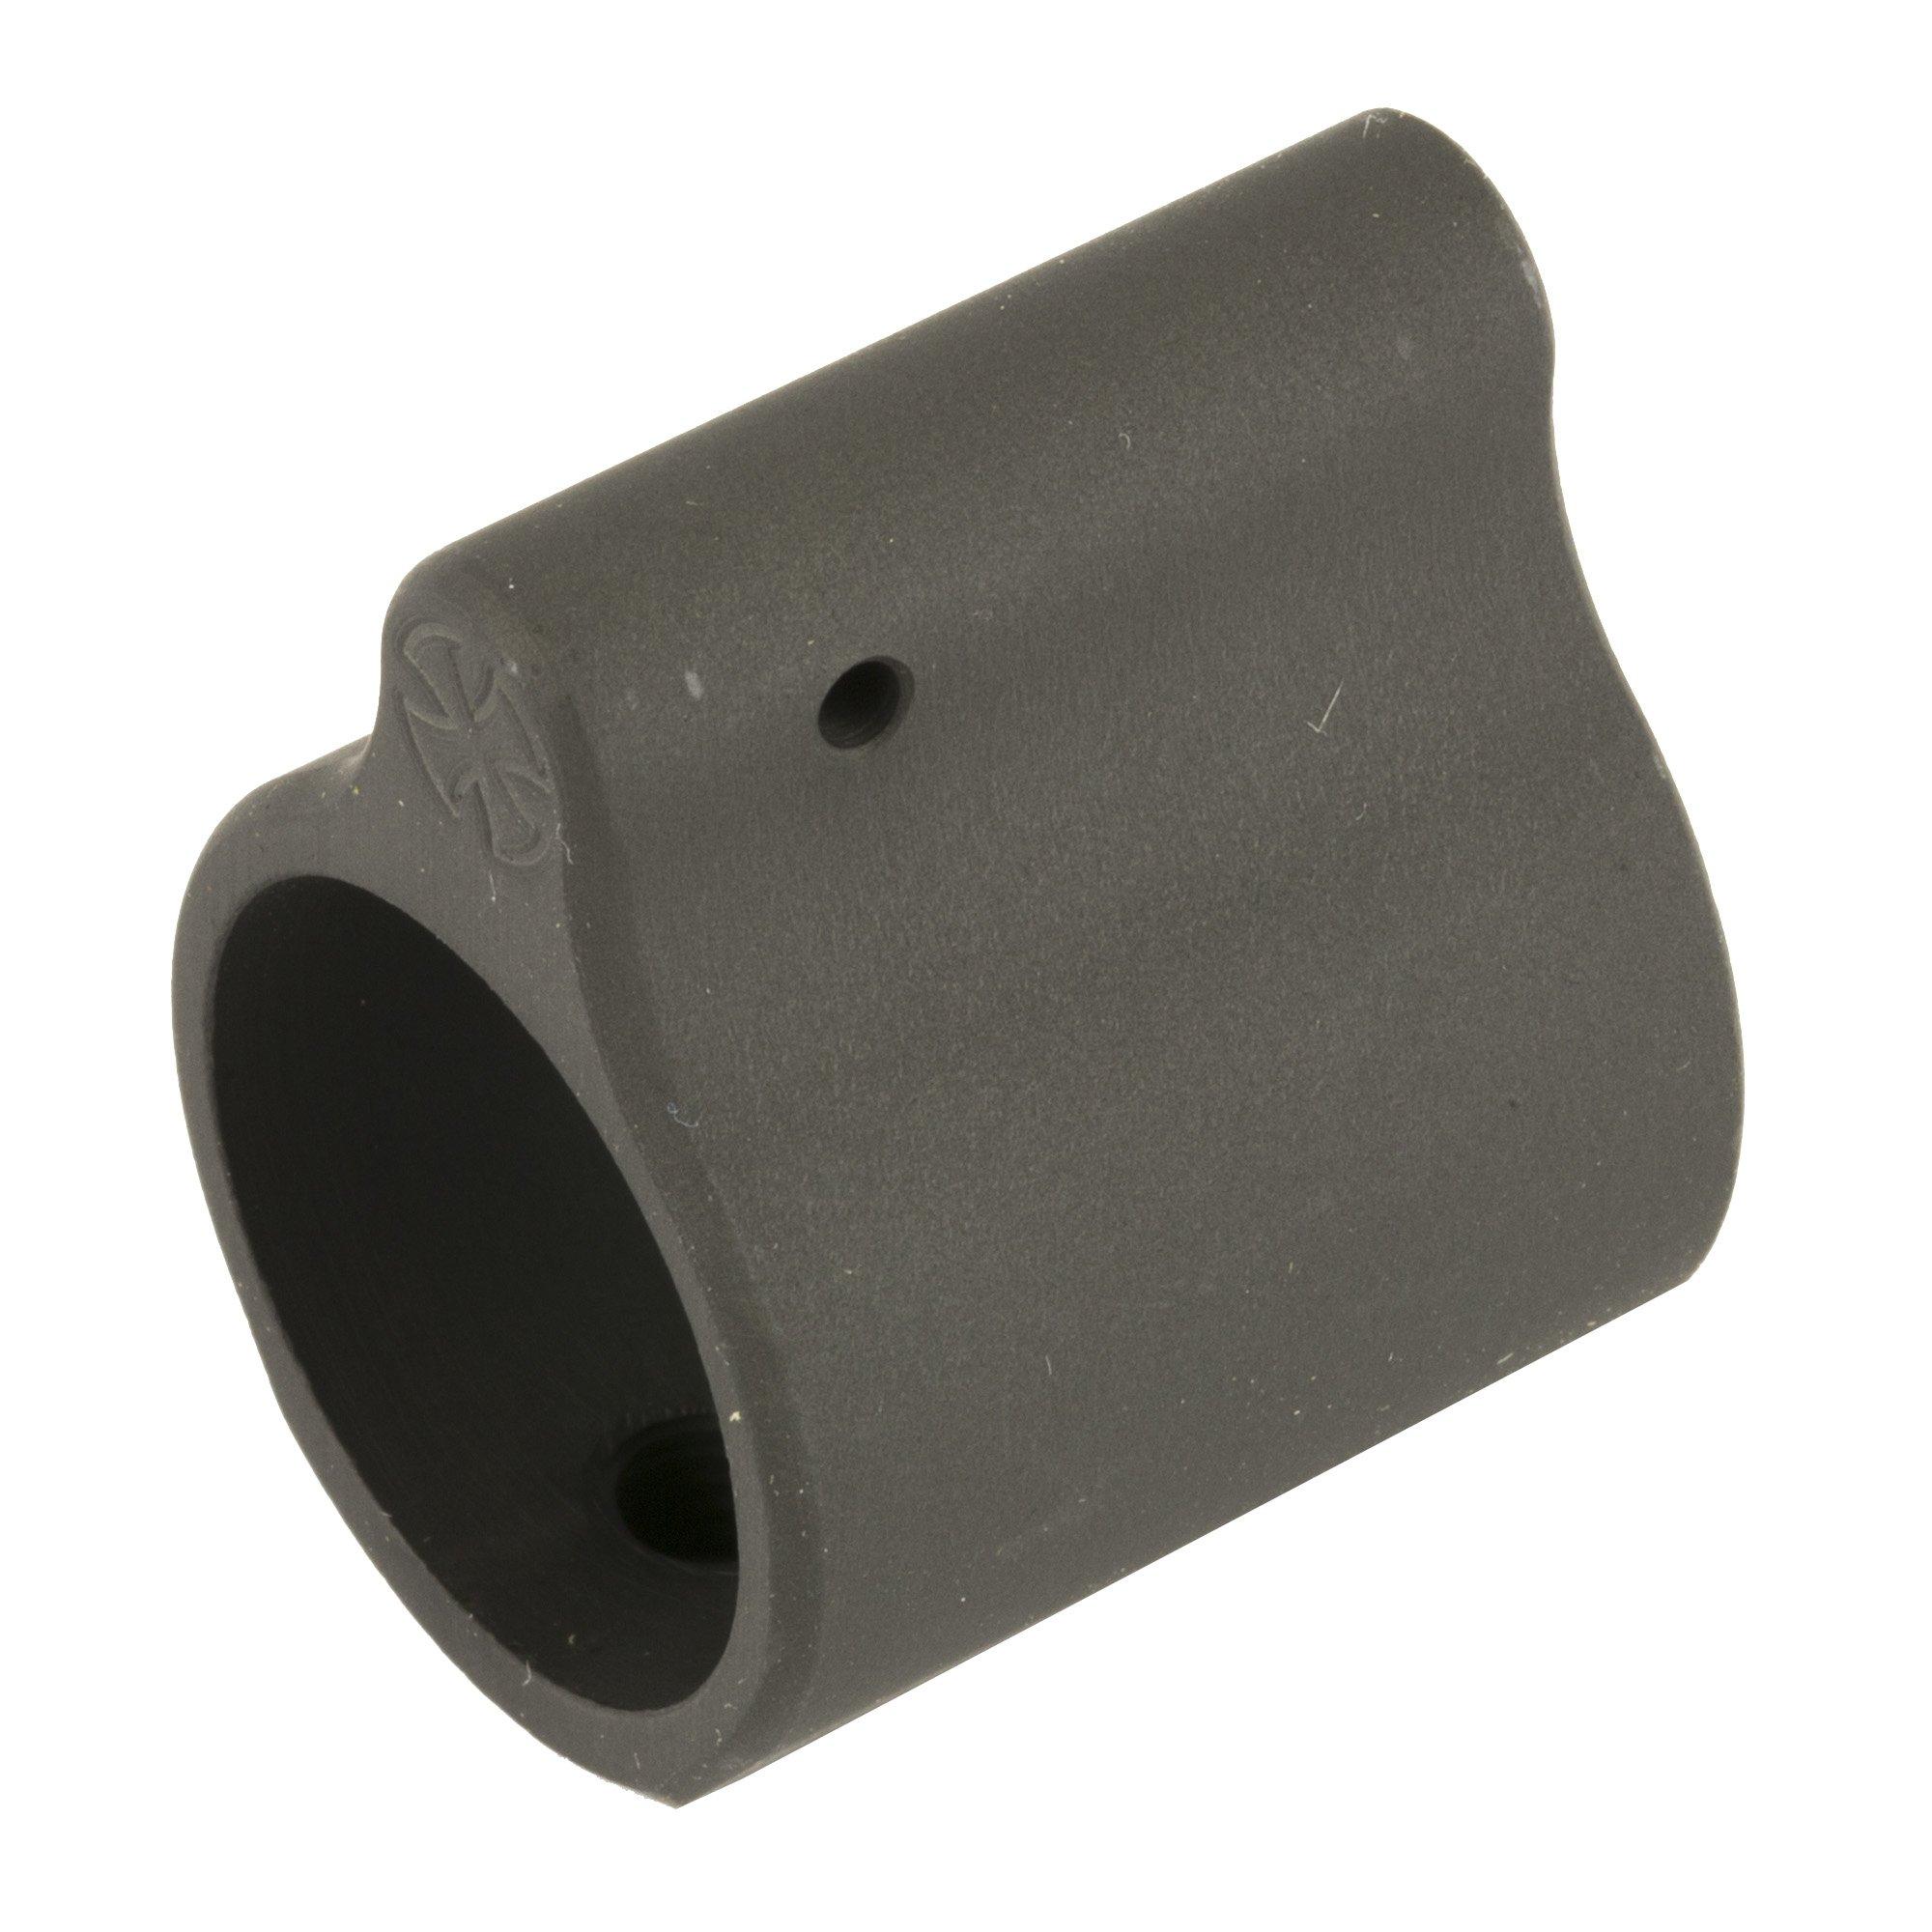 "Noveske .750"" Low Profile Gas Block"